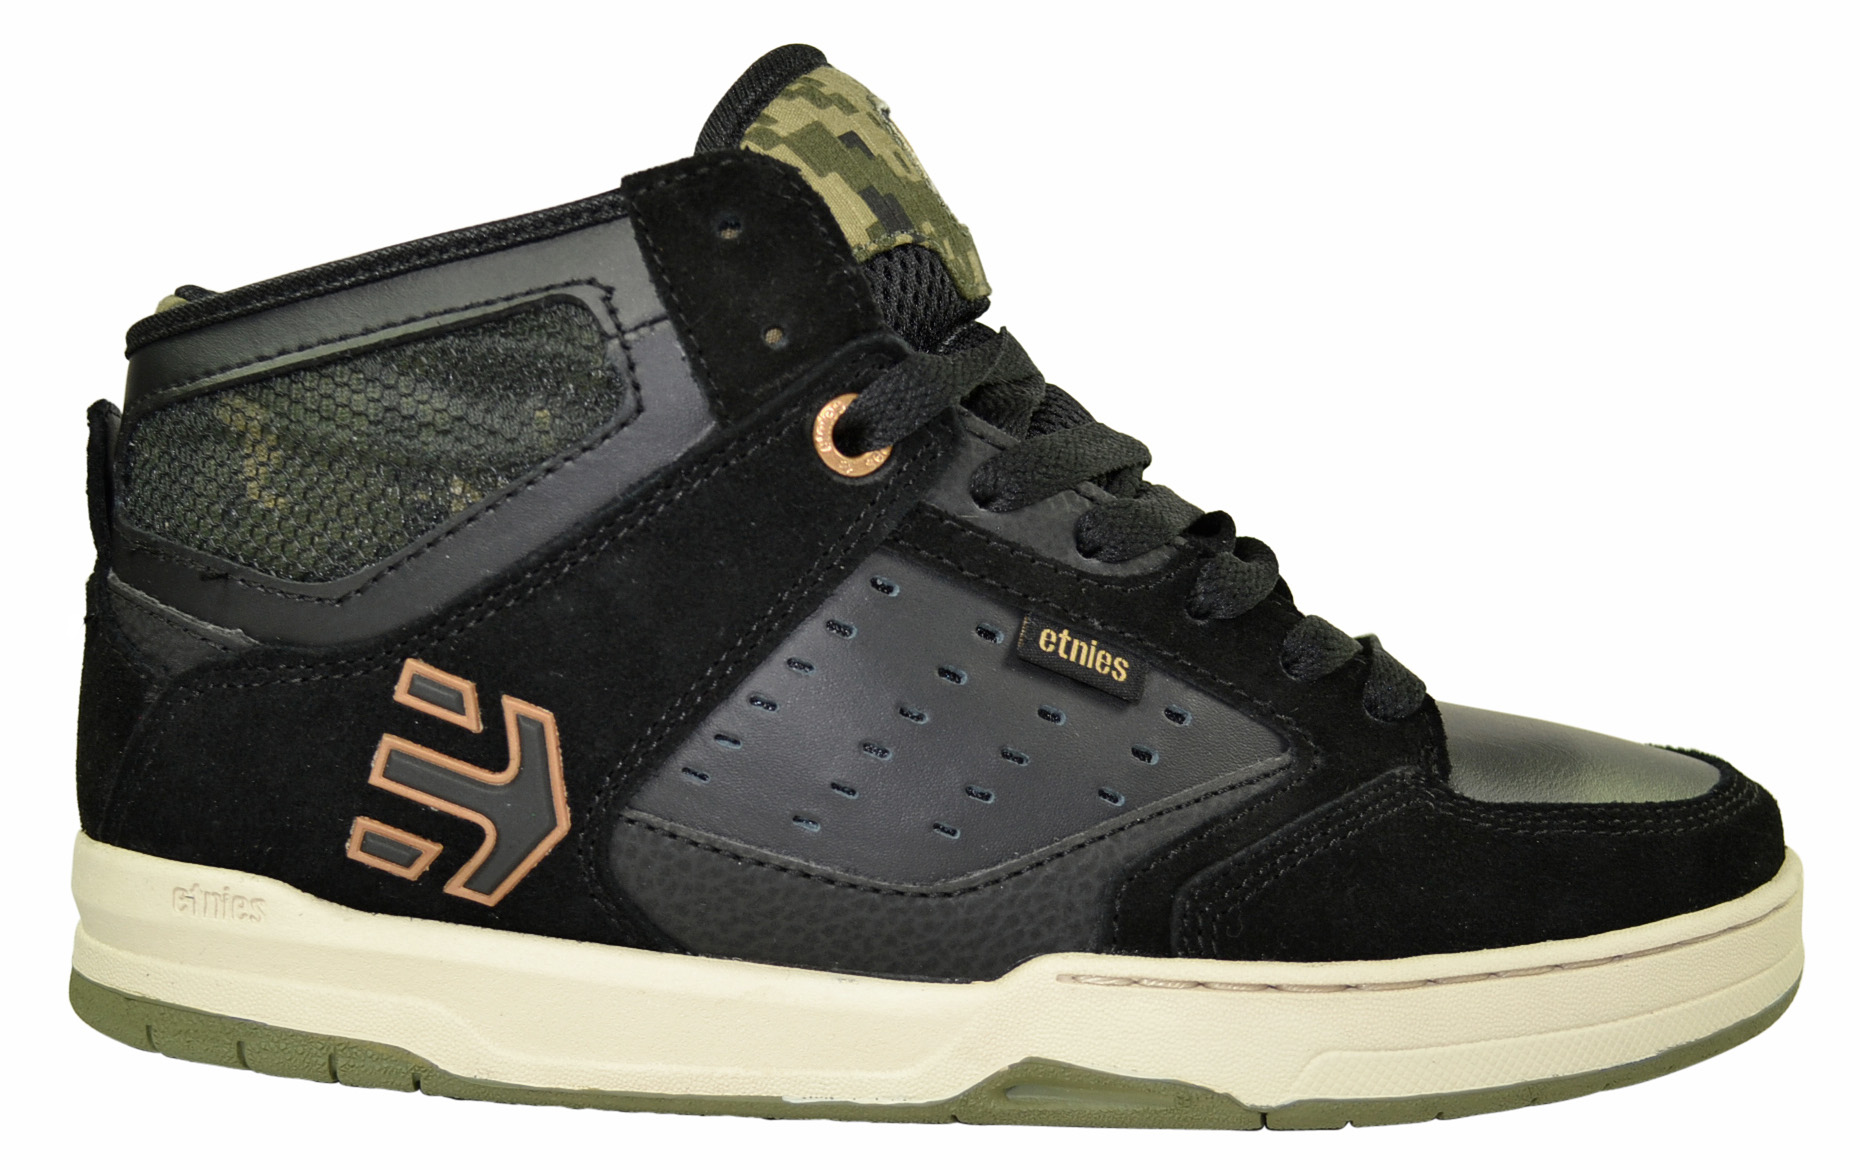 ab7b35c9eebb09 Etnies Cartel Mid black camo Skater Schuhe Sneaker Camouflage ...